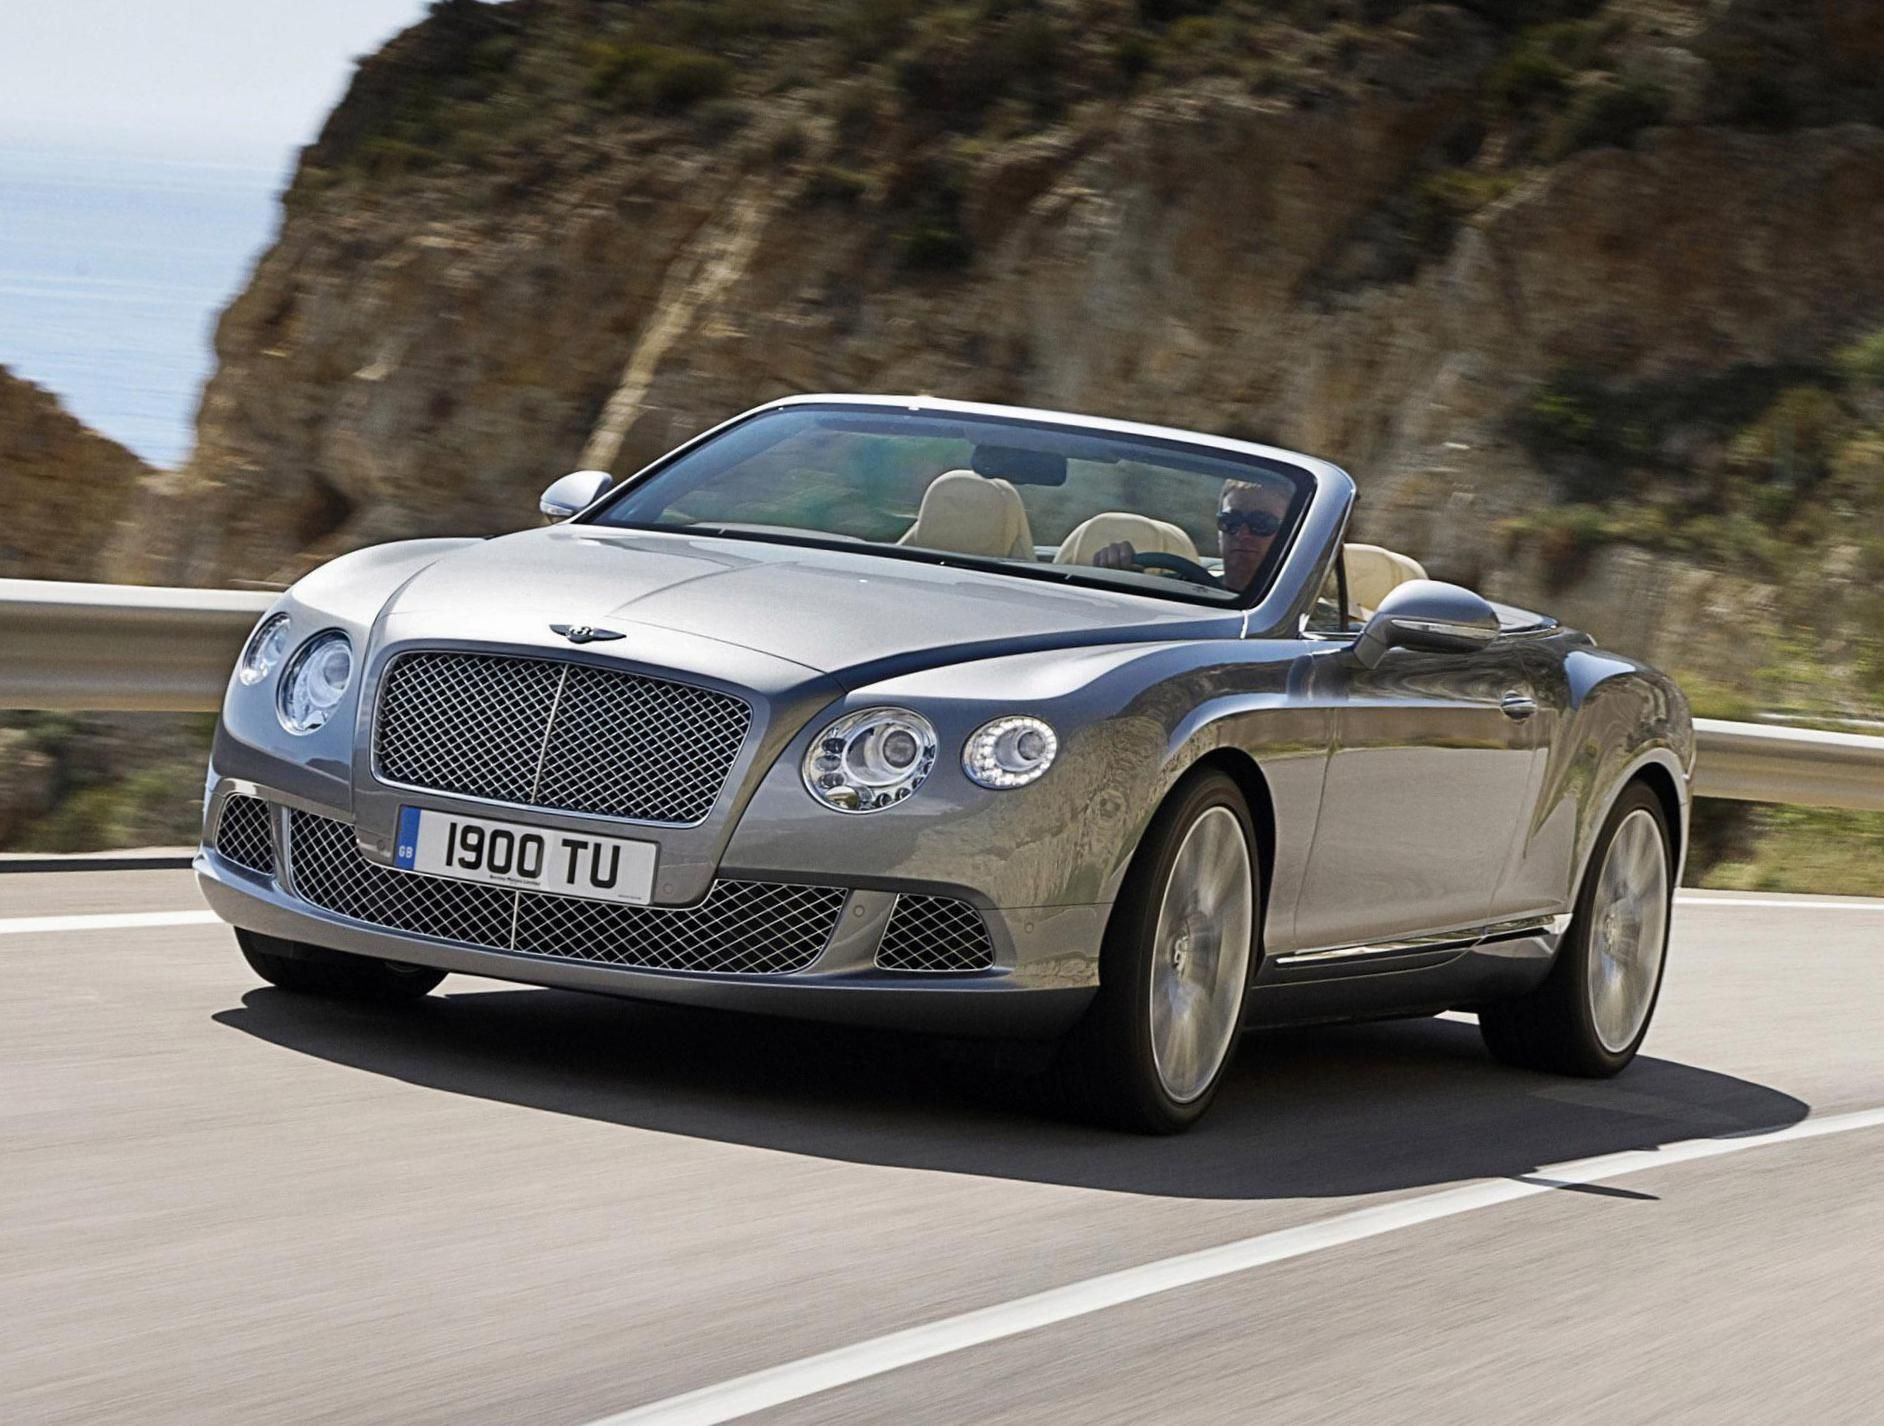 Bentley Continental GTC Photos and Specs. Photo Bentley